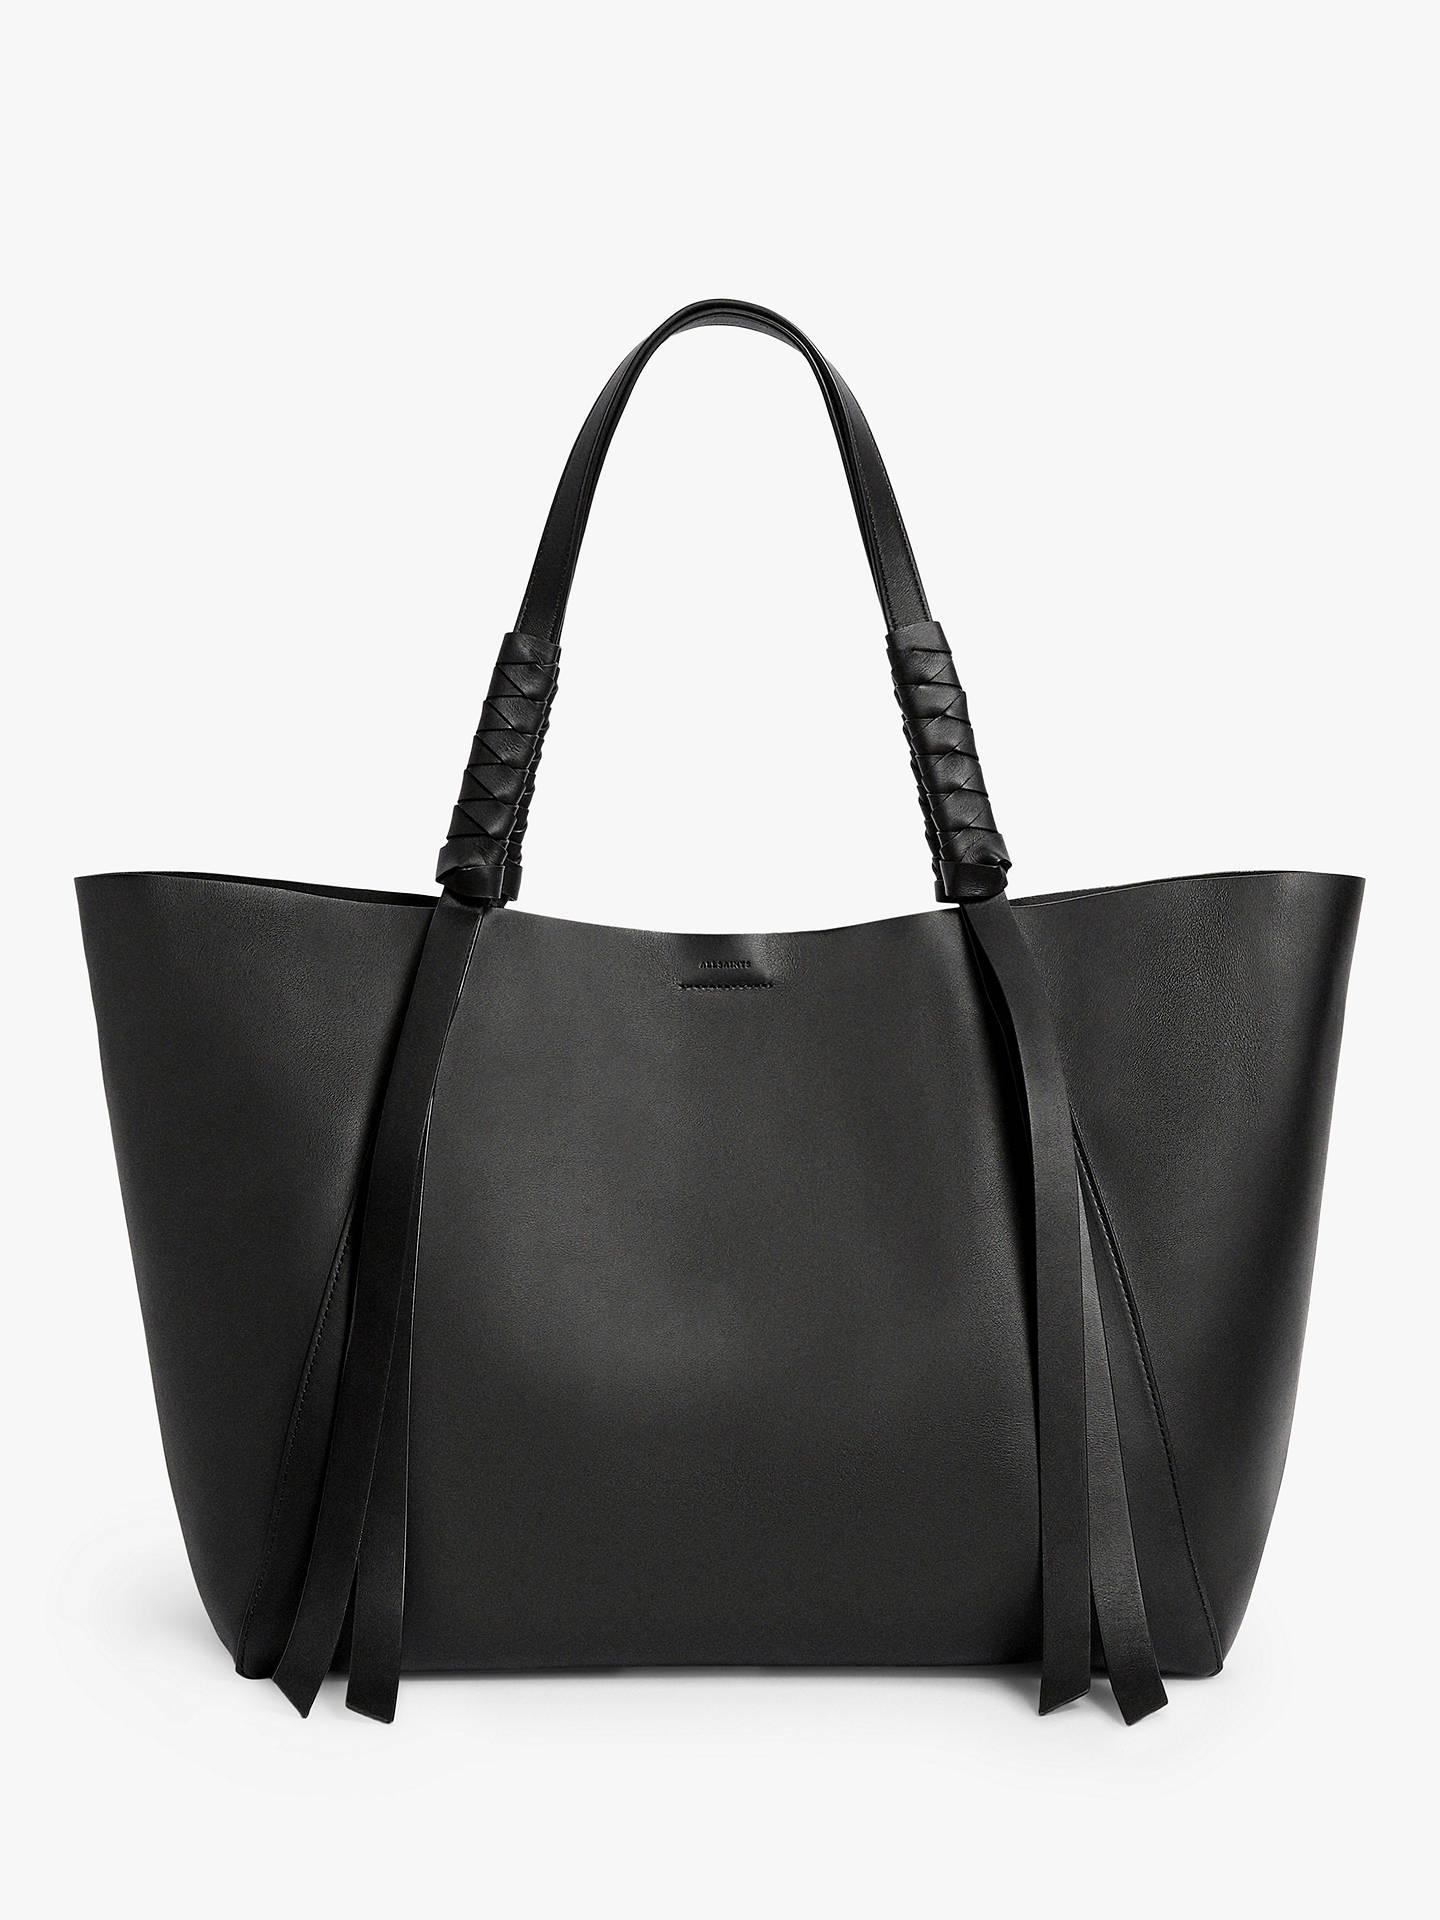 7edef17dfc4e AllSaints Voltaire East West Leather Tote Bag at John Lewis   Partners